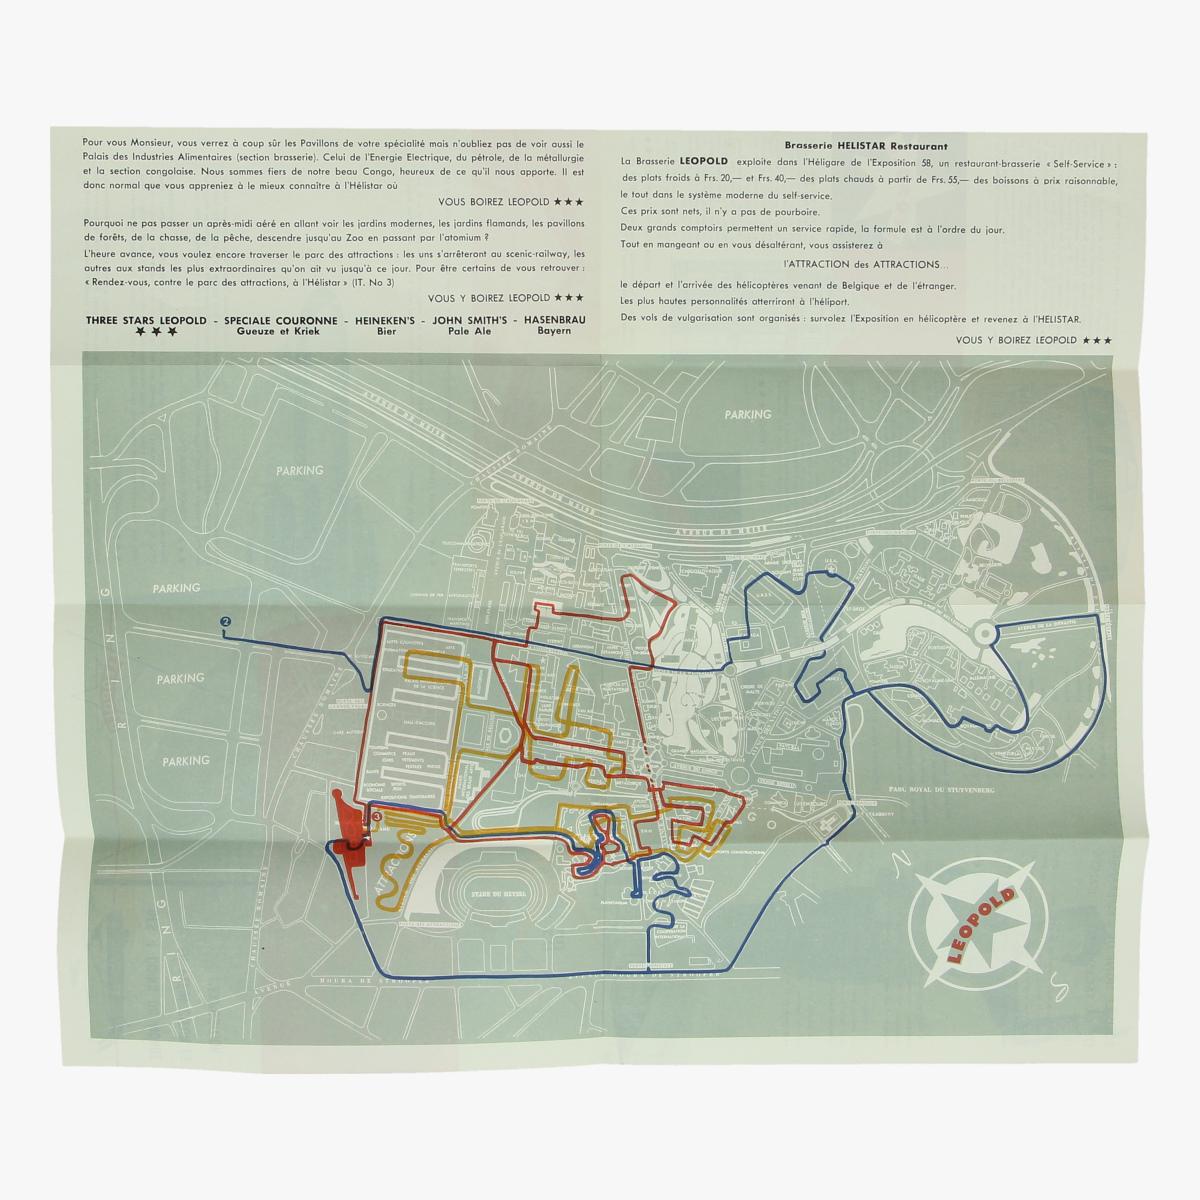 Afbeeldingen van expo 58 des 4 du monde ..en plein coeur de l' exposition sabena , leopold